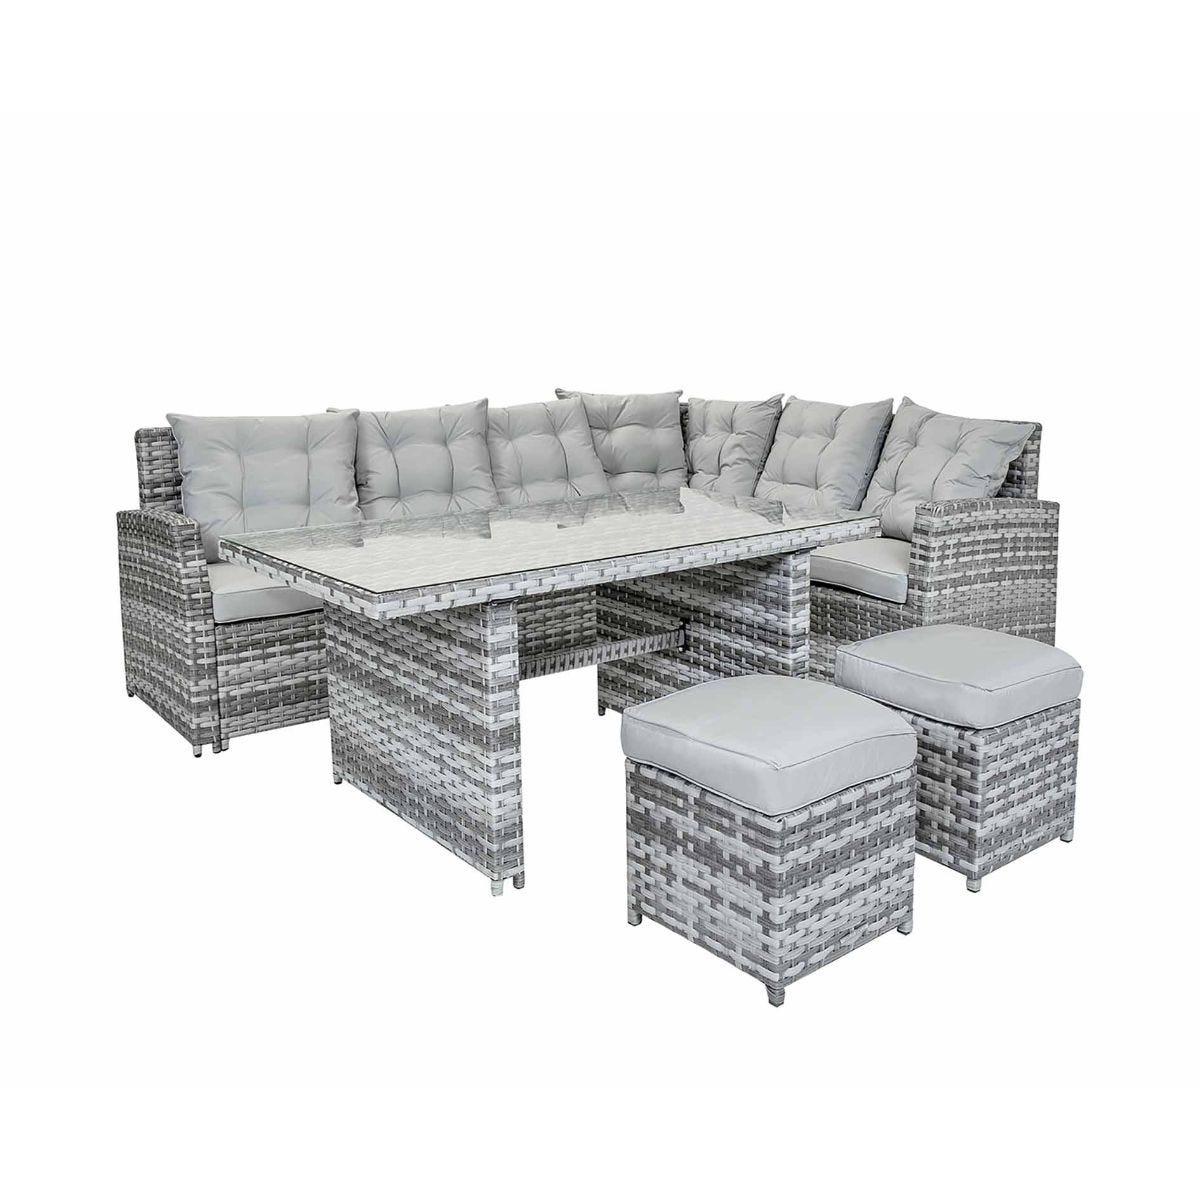 Charles Bentley Milano 6 Seater Multifunctional Rattan Garden Lounge Set, Grey